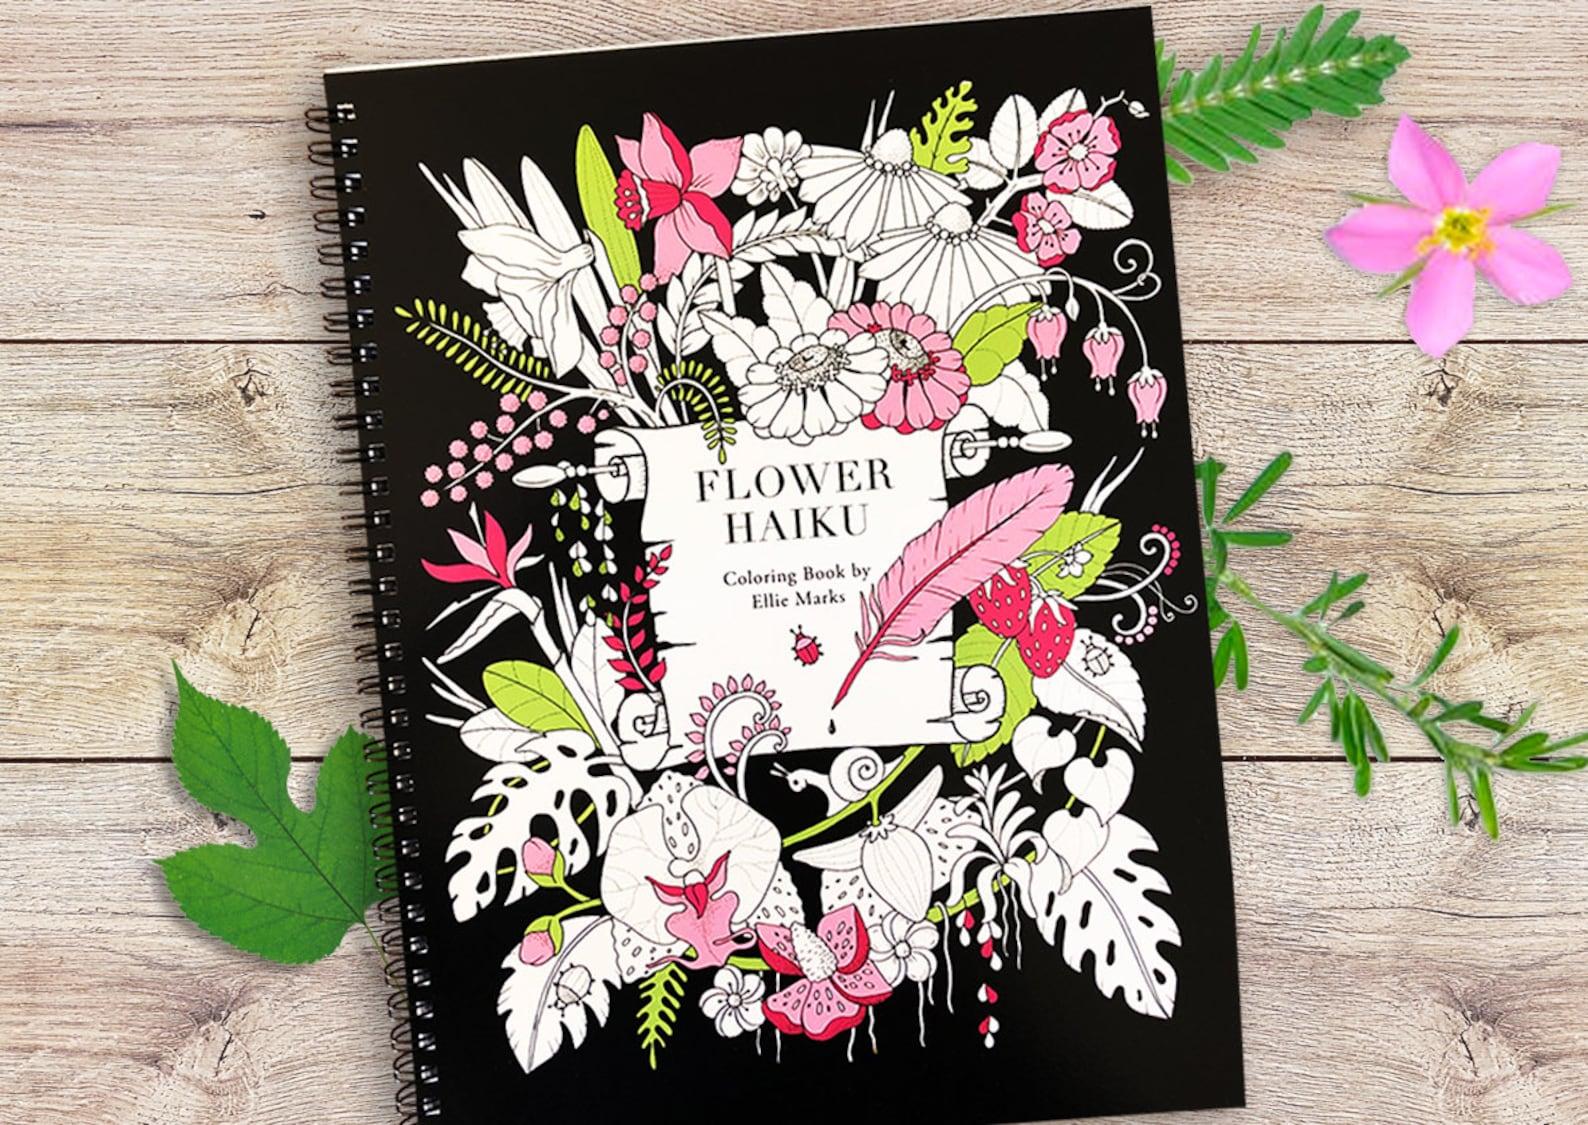 Flower Haiku Coloring Book